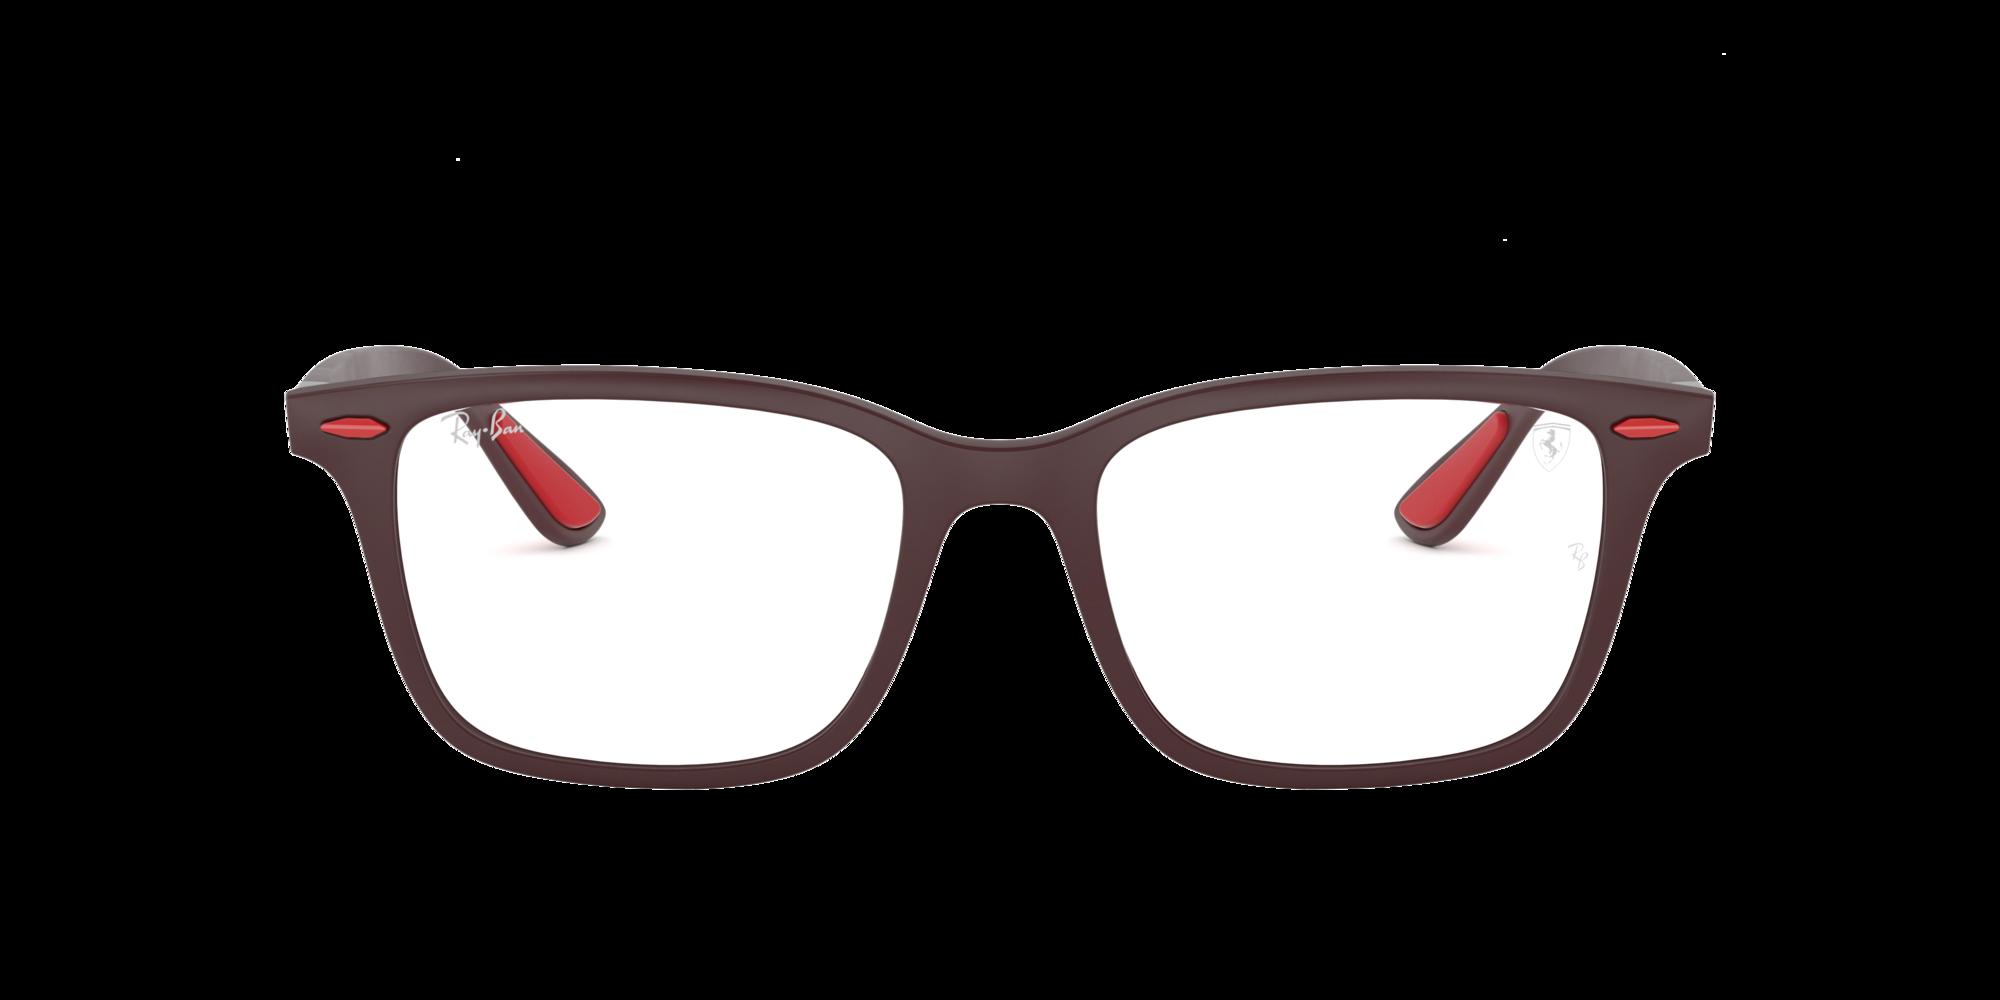 Image for RX7144M FERRARI from LensCrafters   Glasses, Prescription Glasses Online, Eyewear